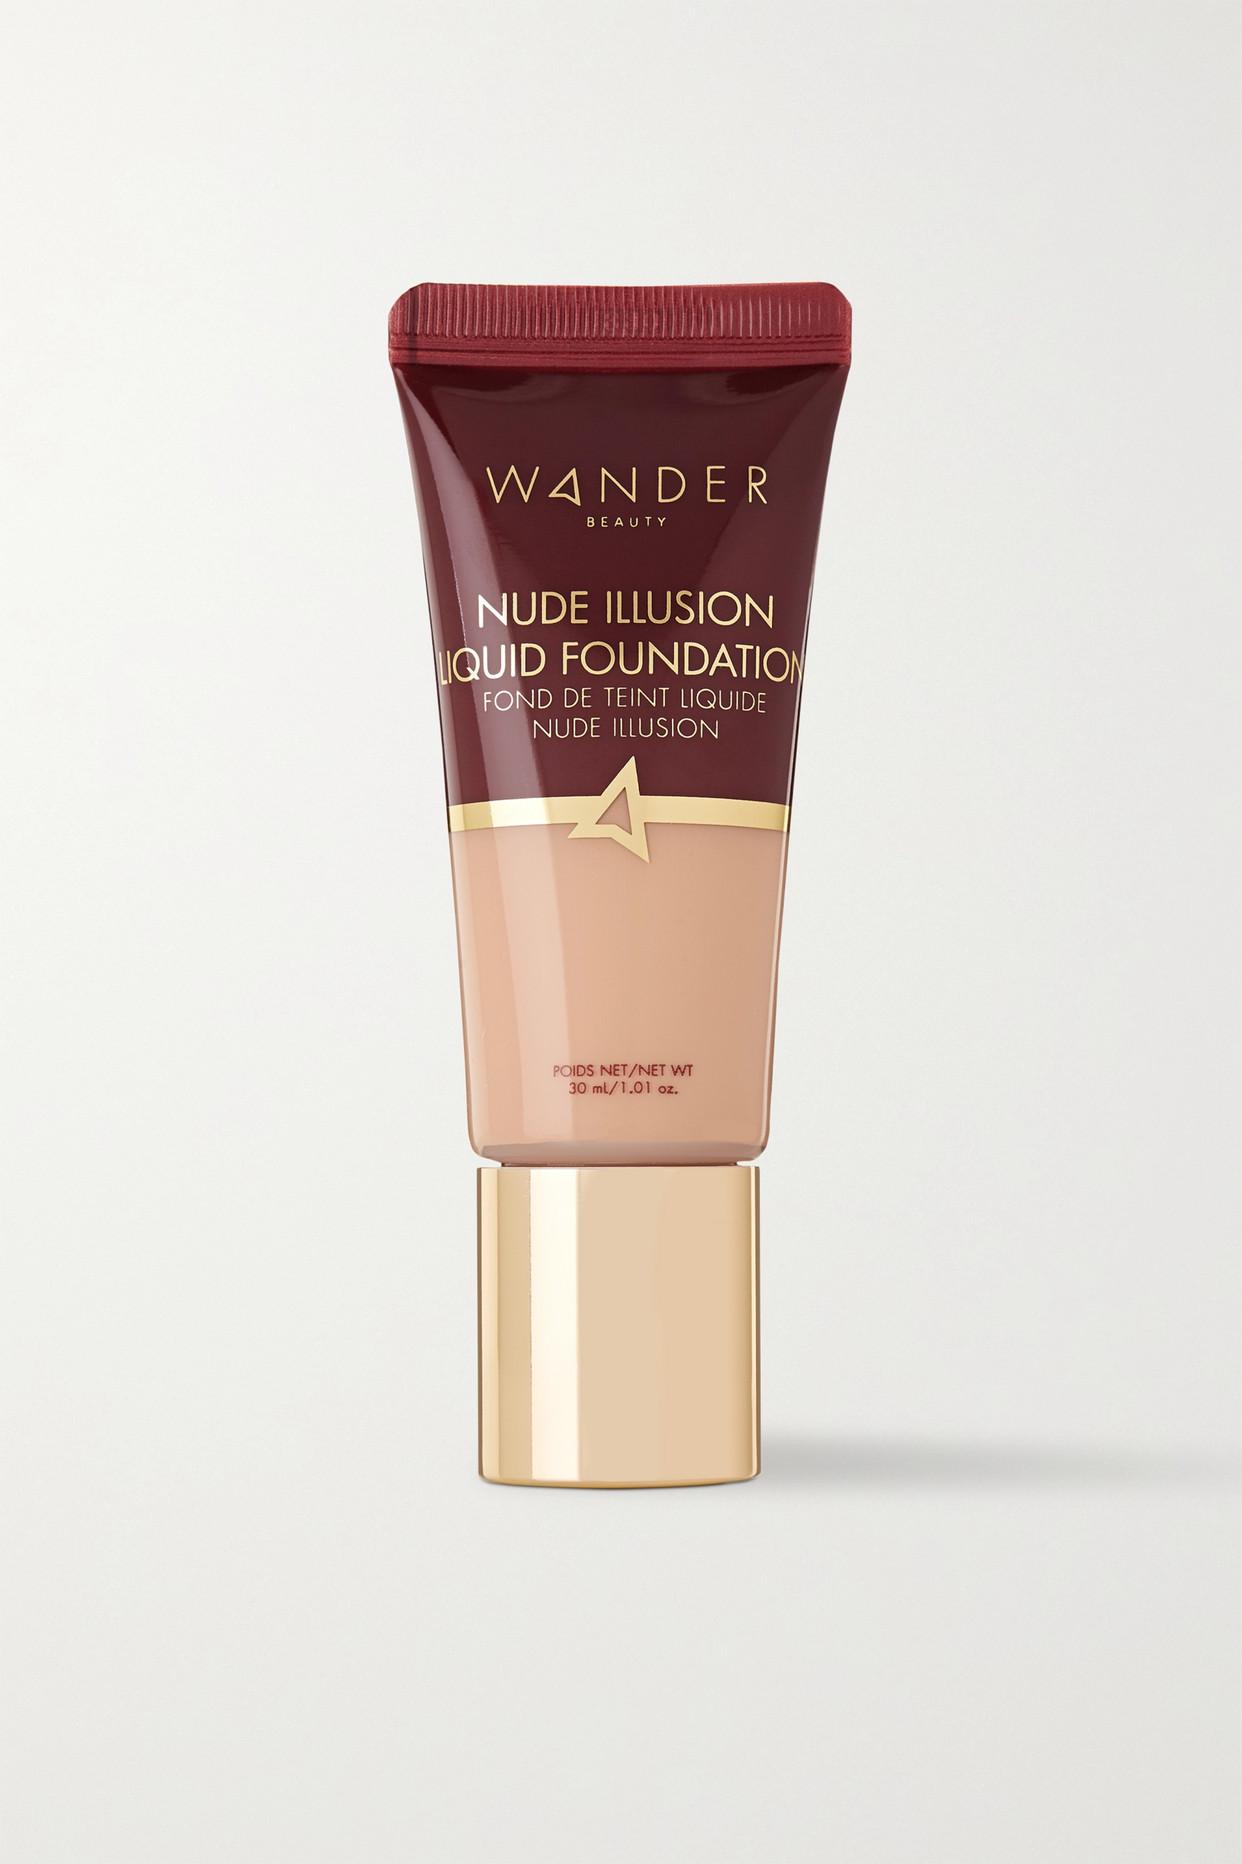 WANDER BEAUTY - Nude Illusion Liquid Foundation - Fair Light - Neutrals - one size